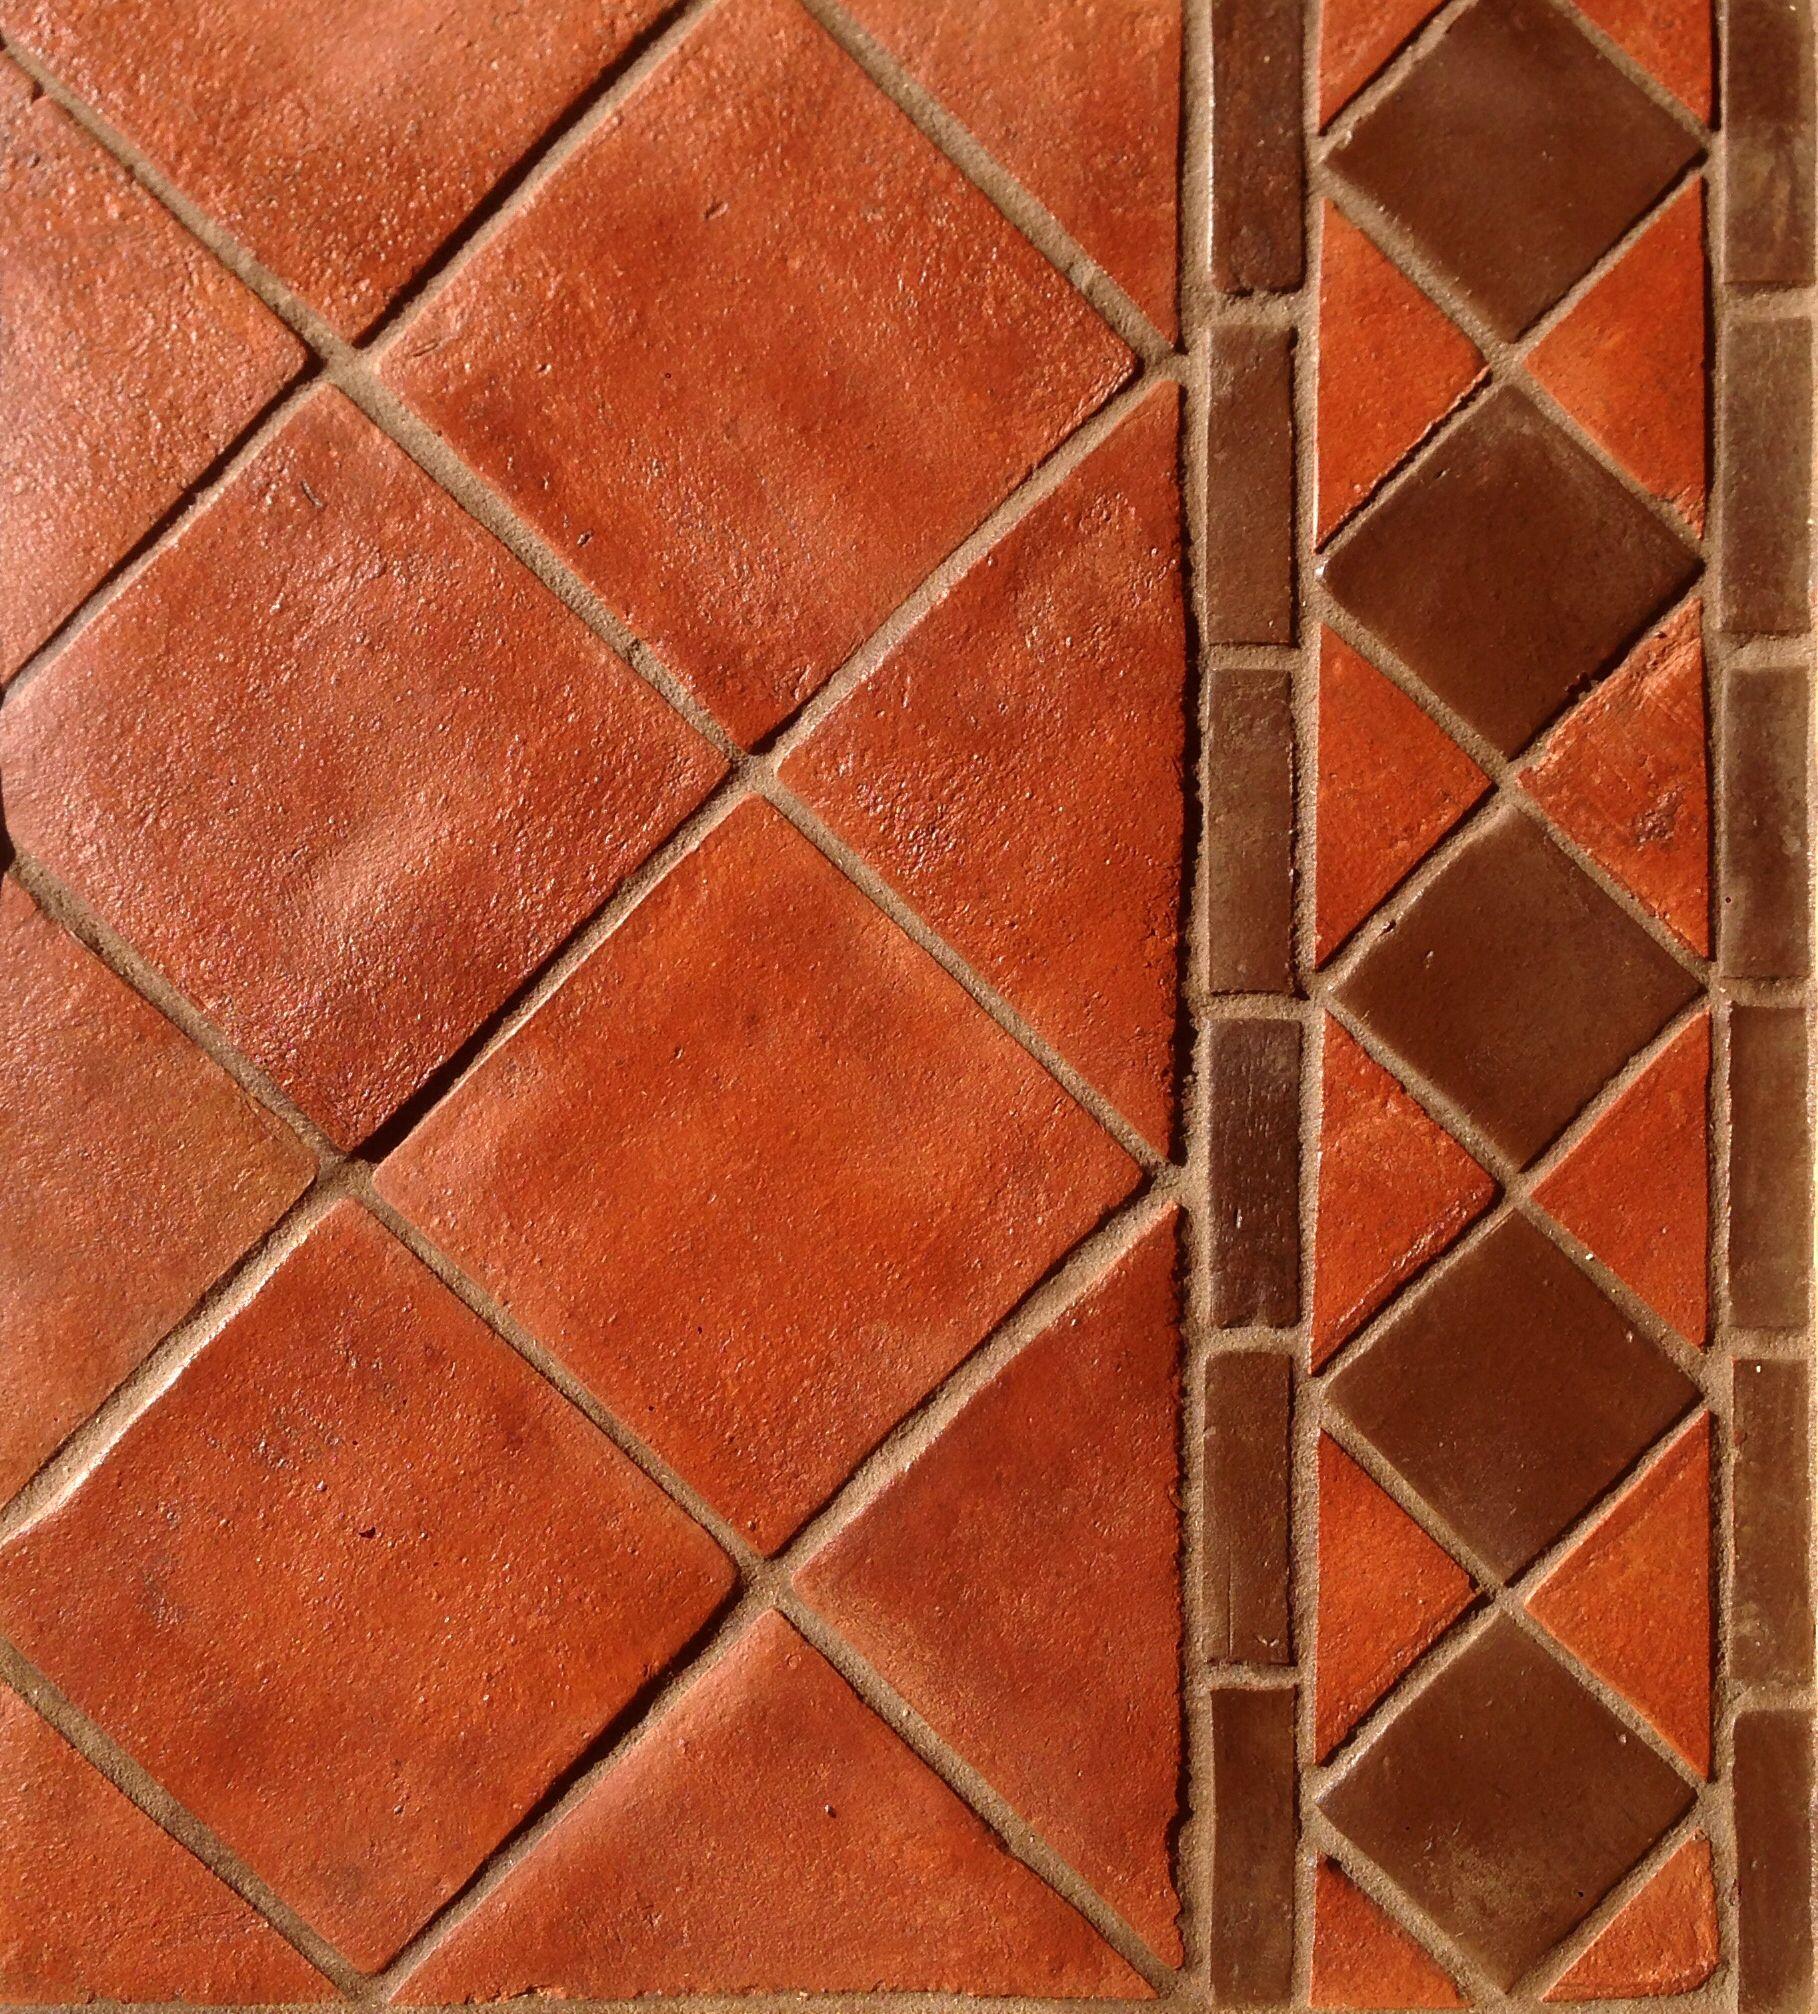 Handmade terracotta floor tiles from spicer tiles terracotta handmade terracotta floor tiles from spicer tiles dailygadgetfo Choice Image